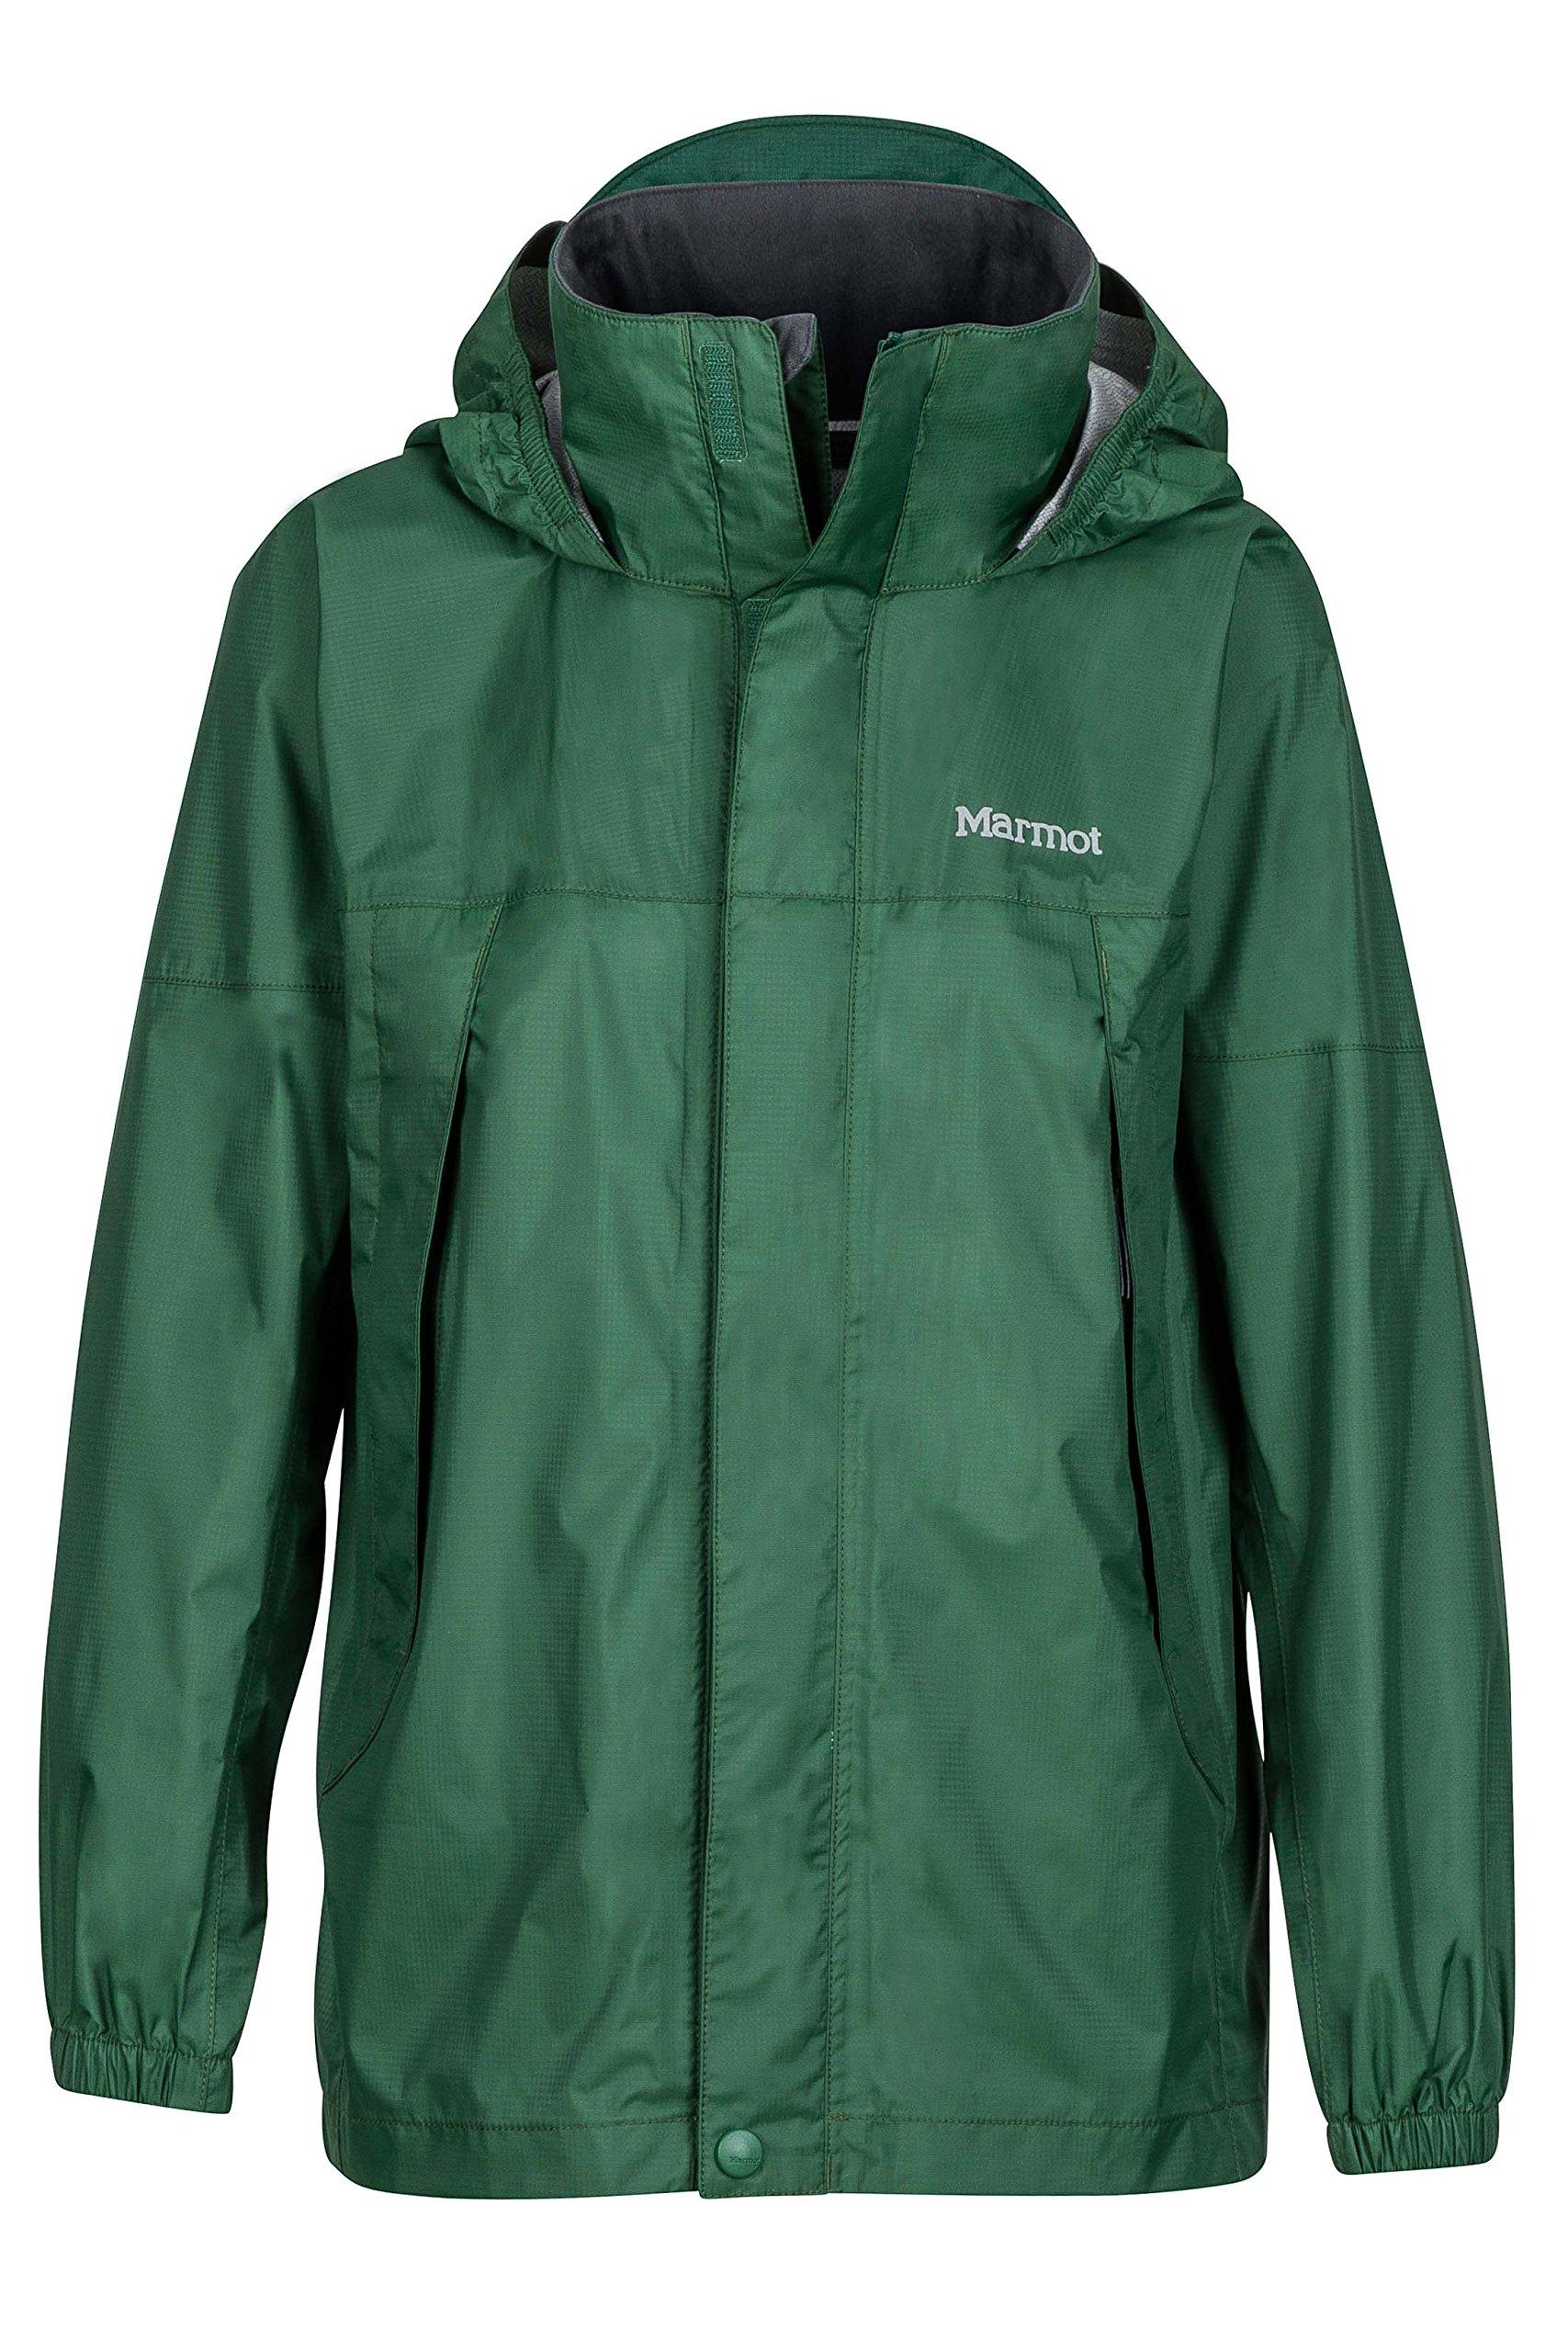 Marmot PreCip Boys' Lightweight Waterproof Rain Jacket, Dark Green, Large by Marmot